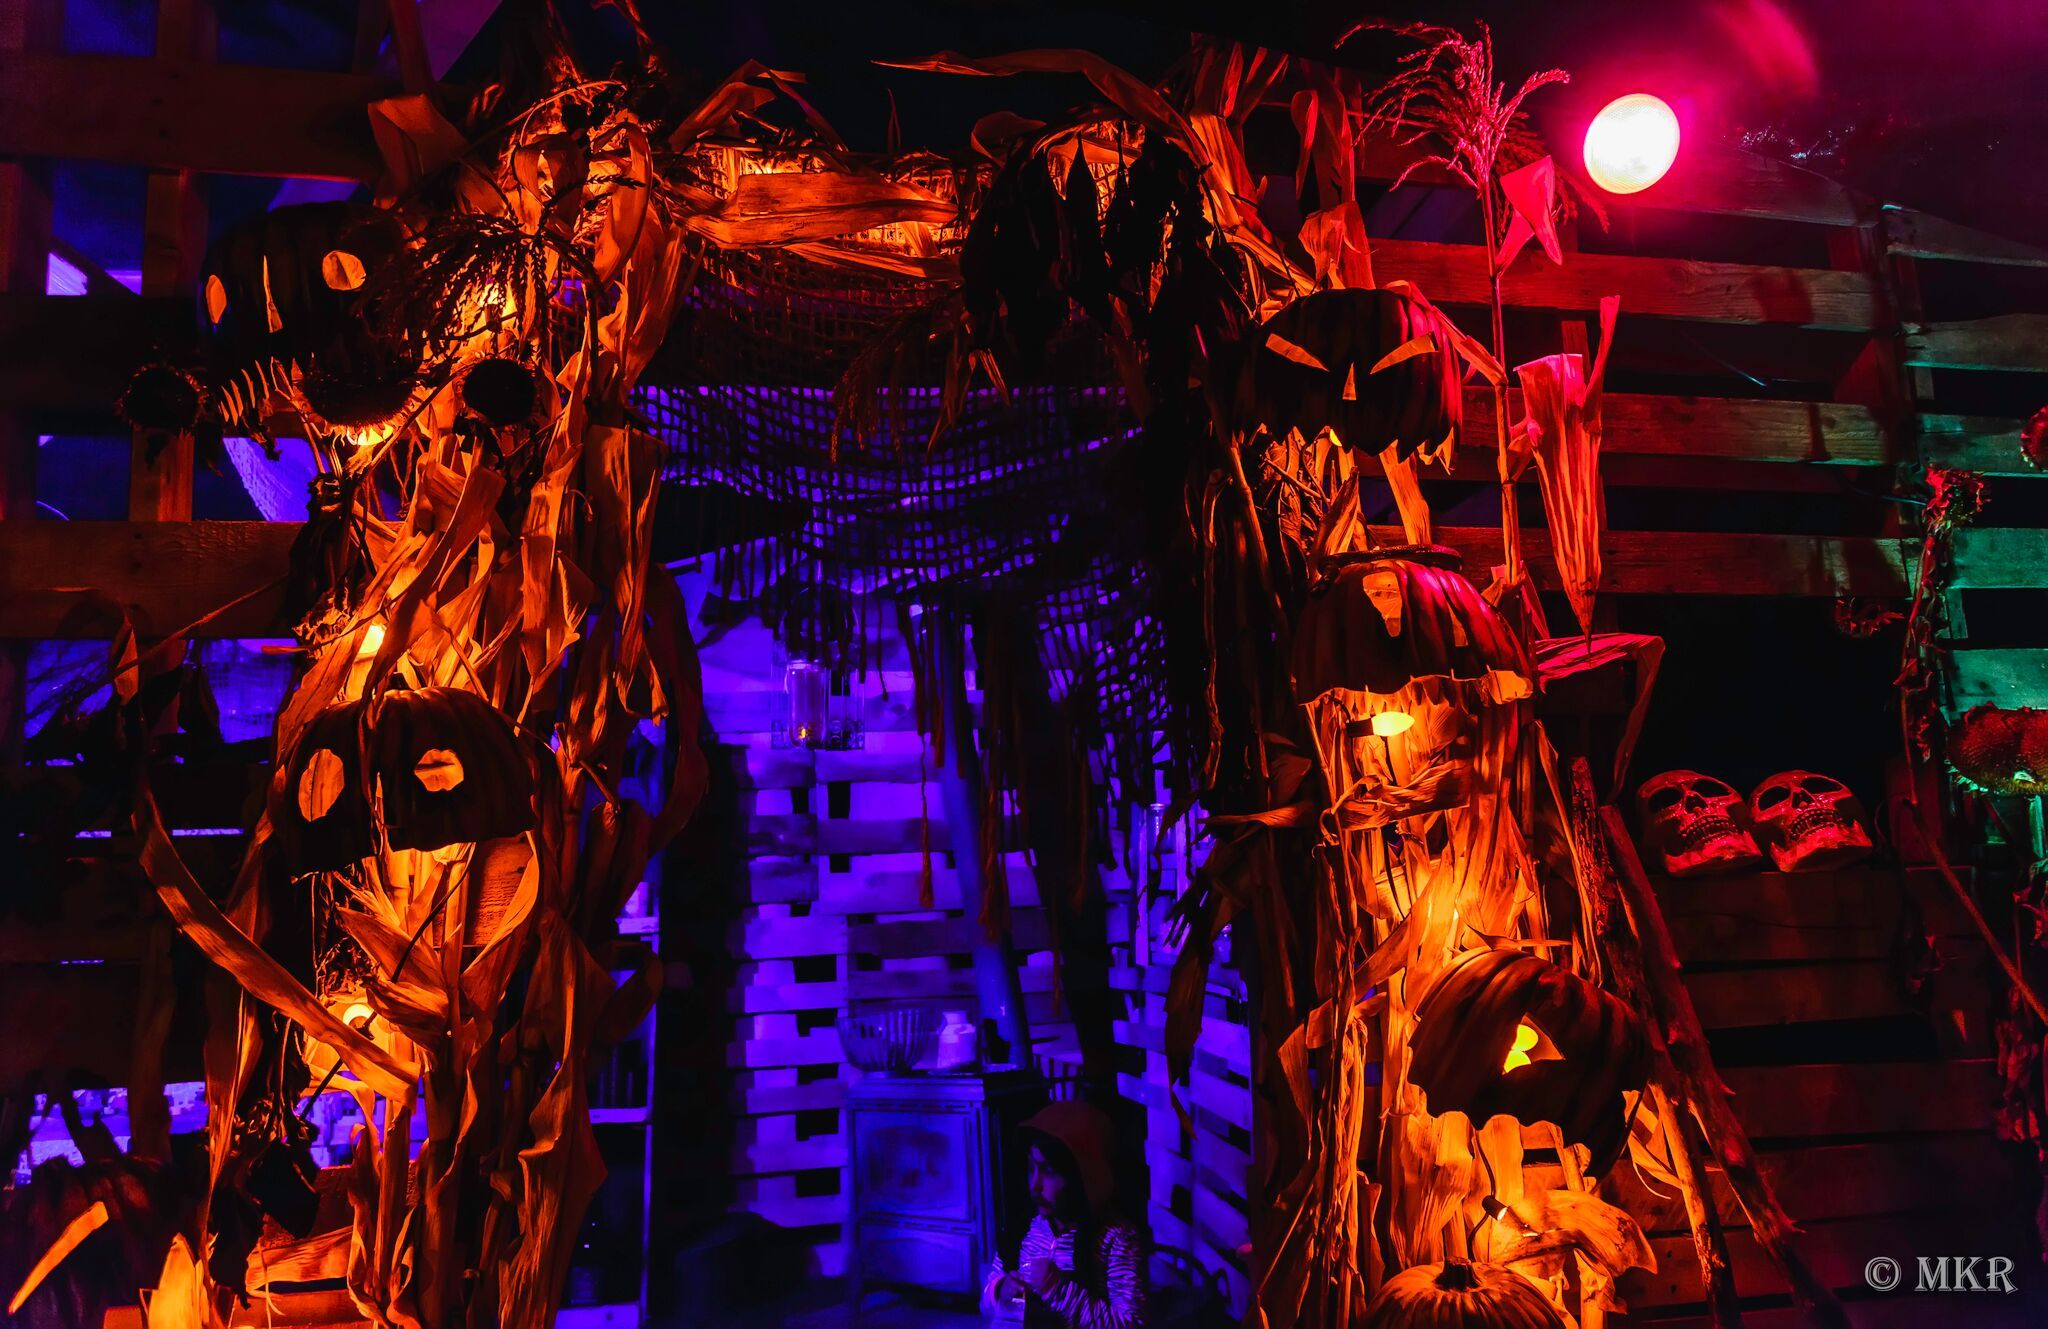 halloween lighting ideas. Halloween Ideas · Great Lighting On The Front Door To Witch Shack.